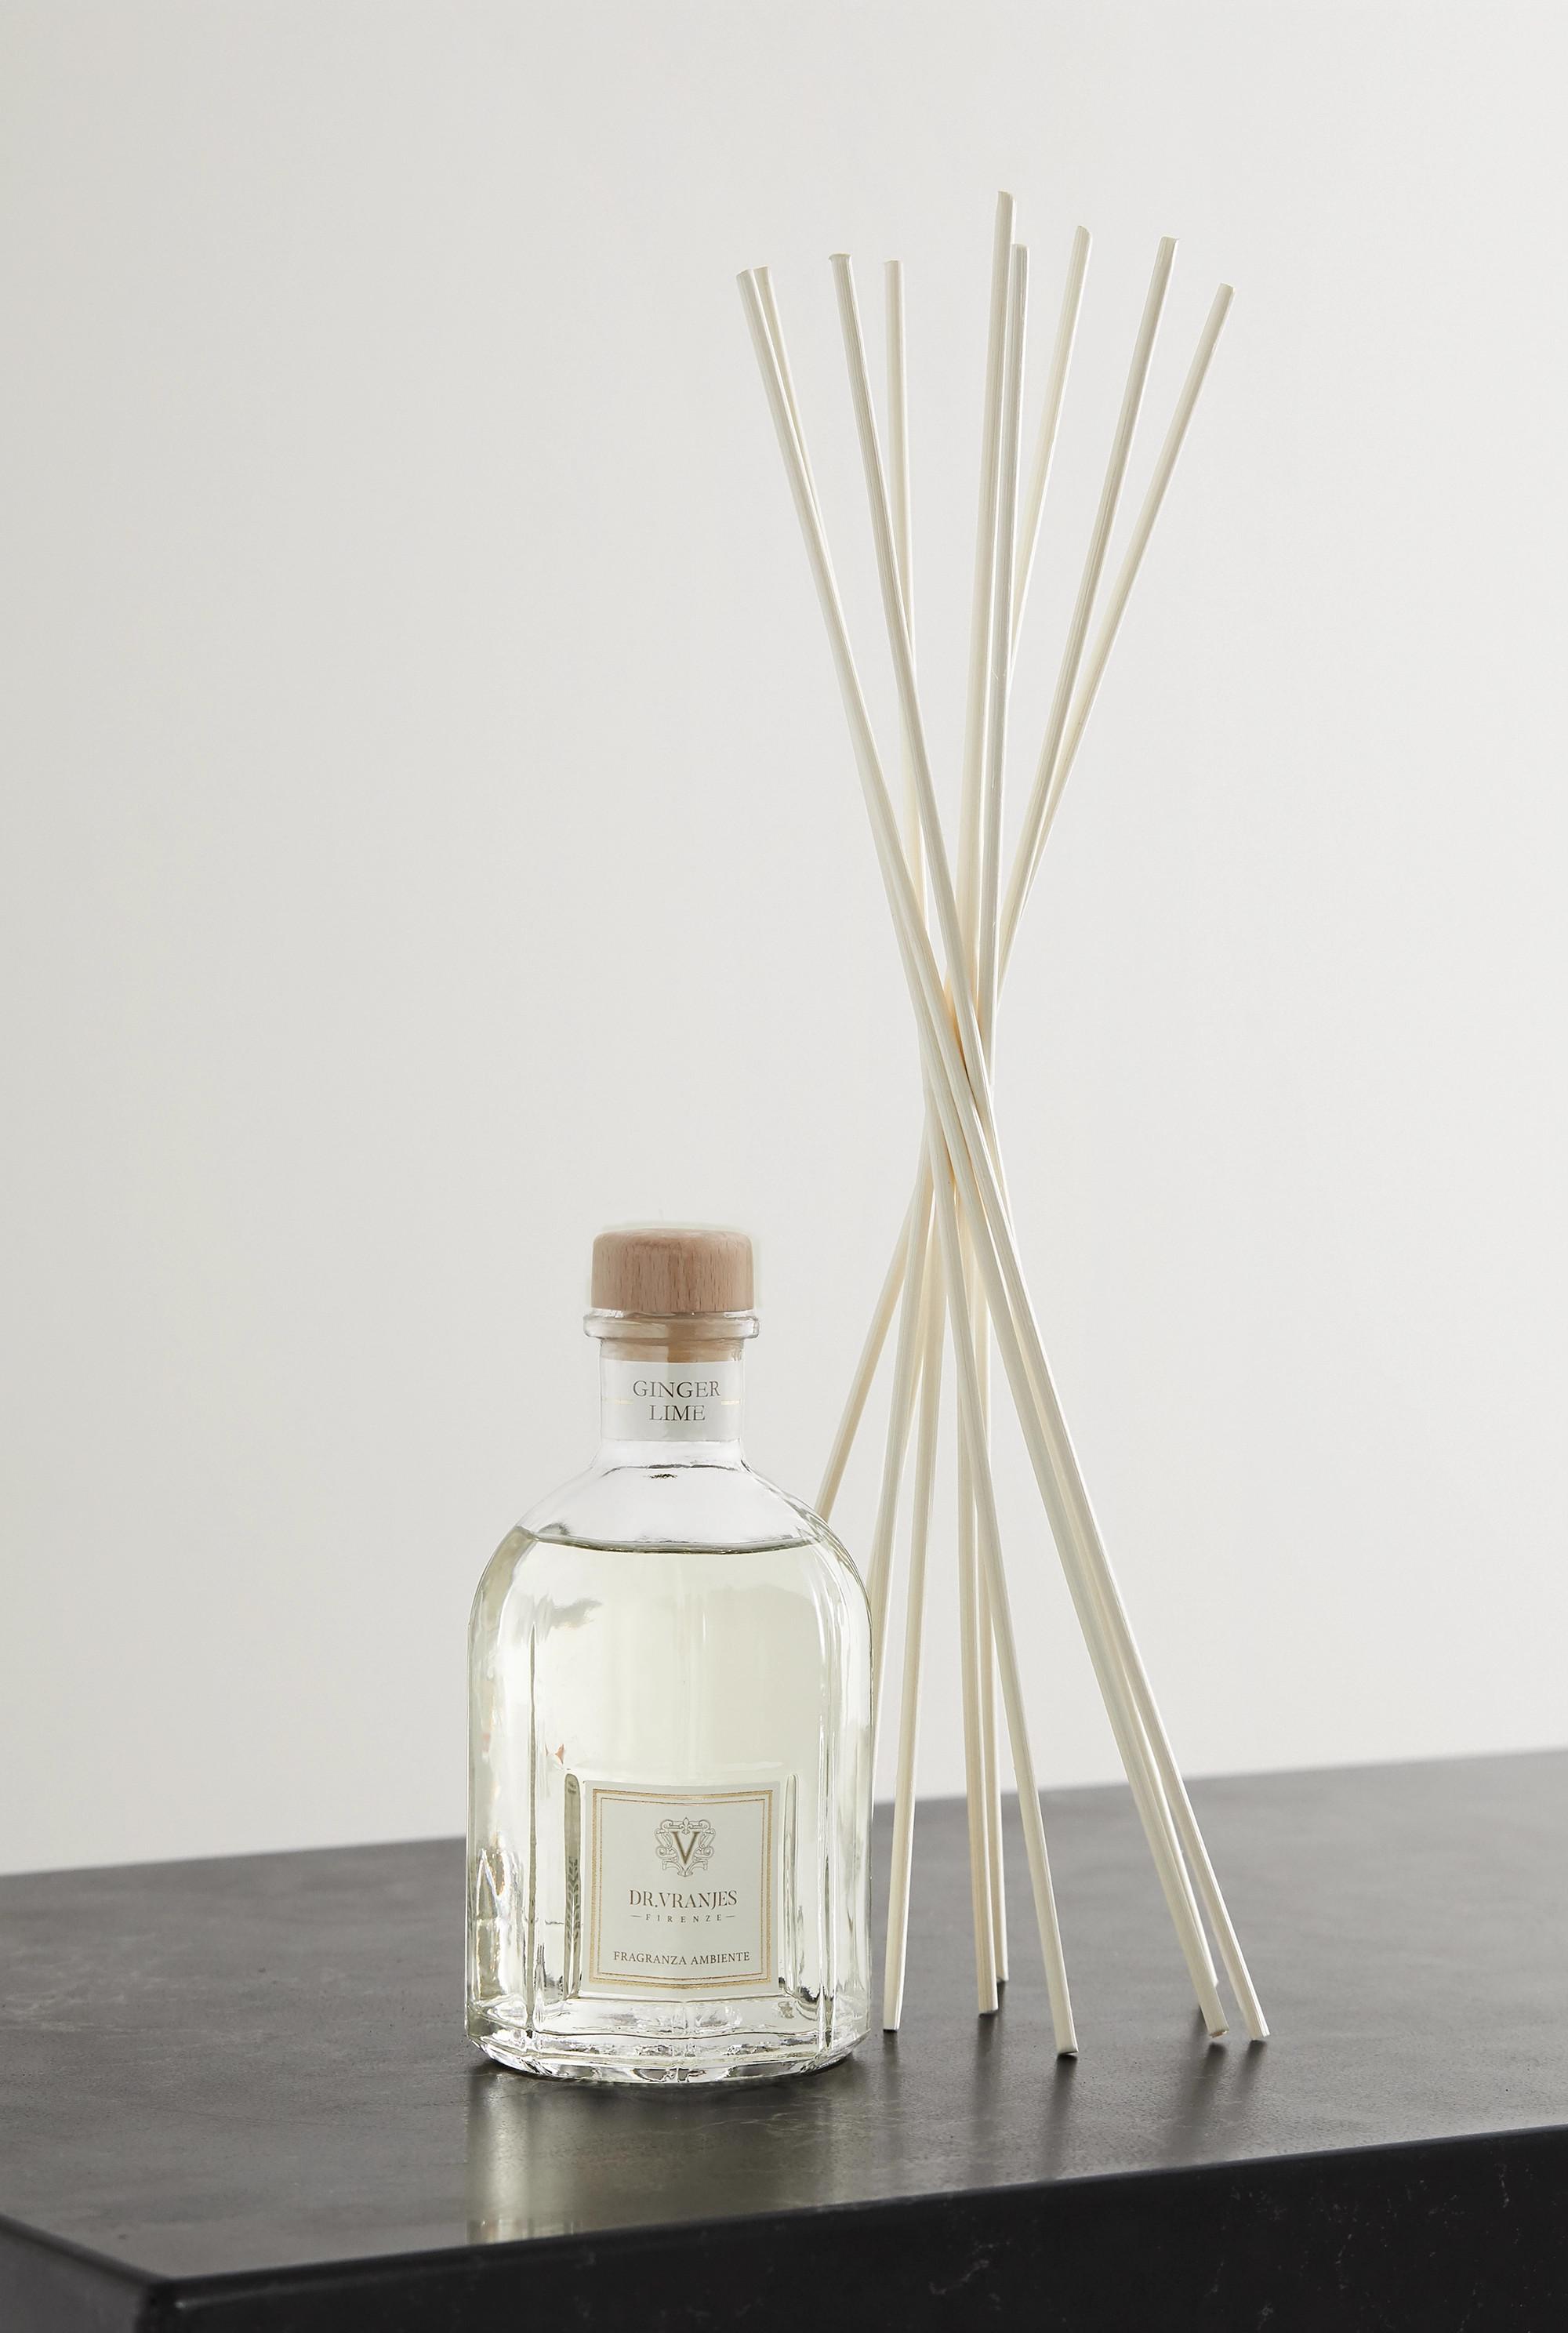 Dr. Vranjes Firenze Reed diffuser - Ginger Lime, 250ml